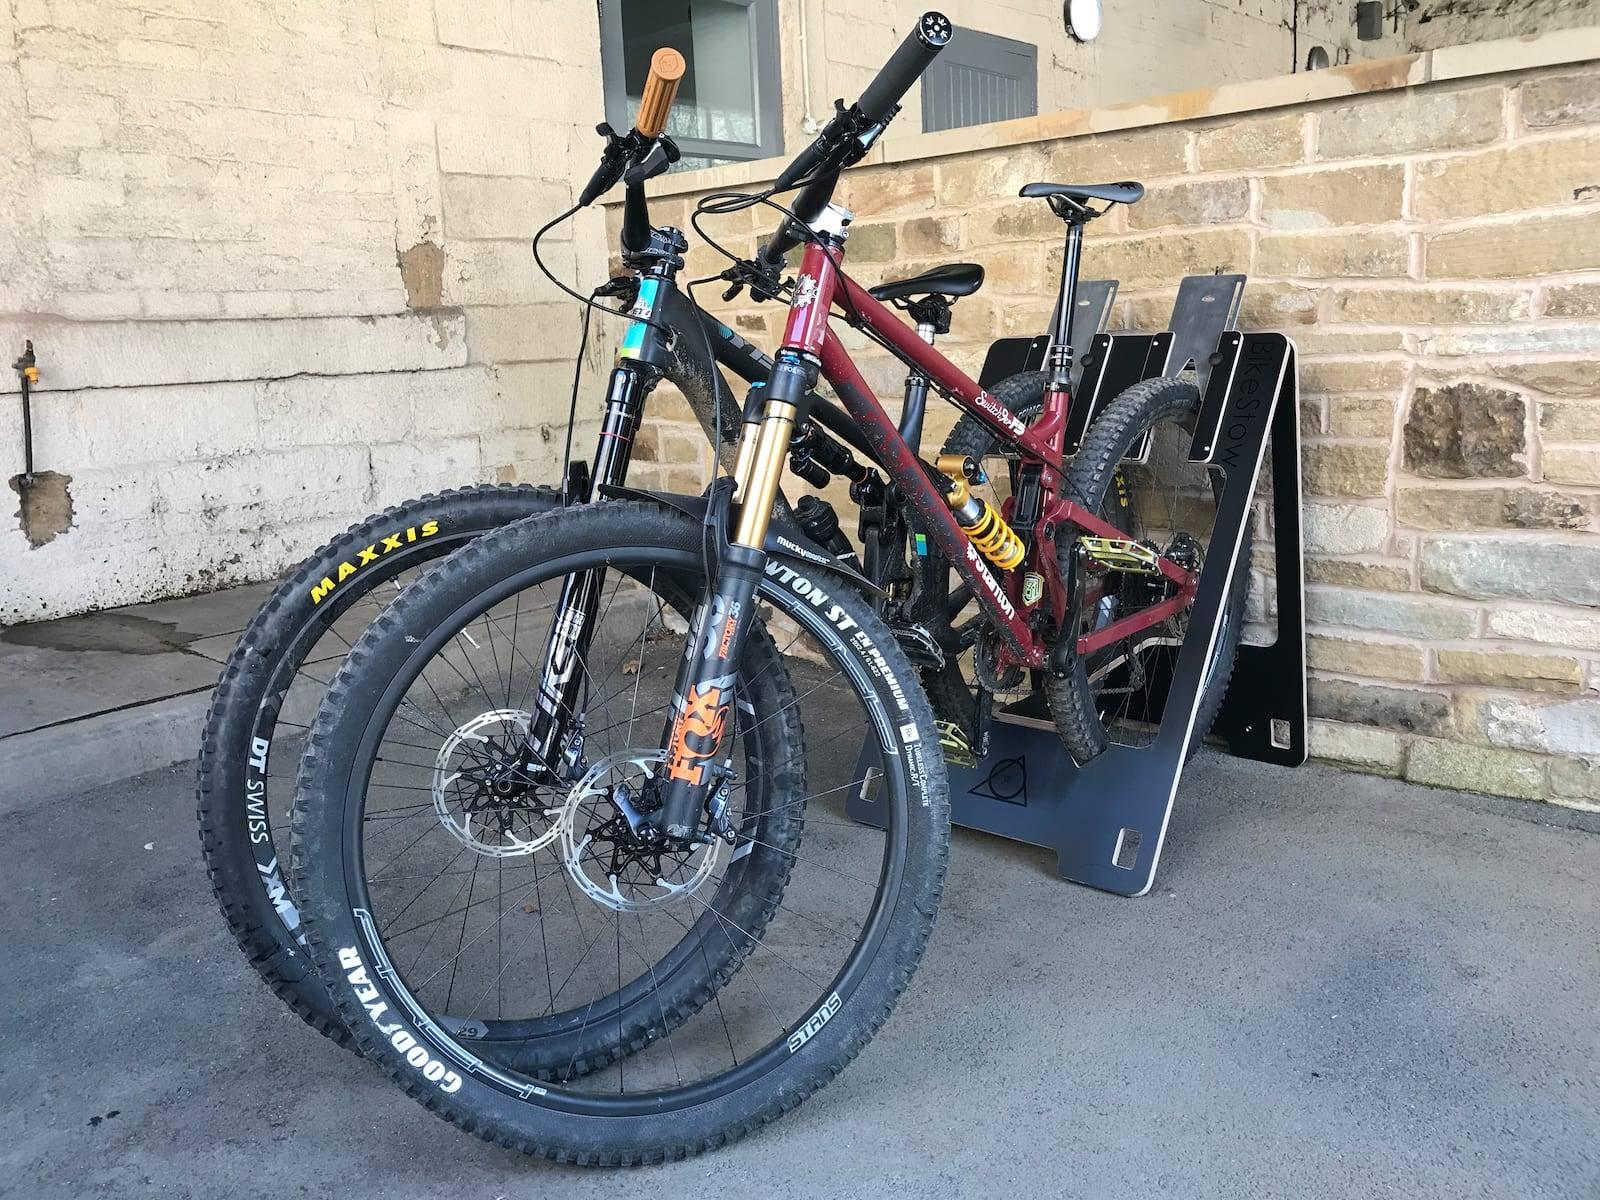 stw 2019 04 17 Bikestow11